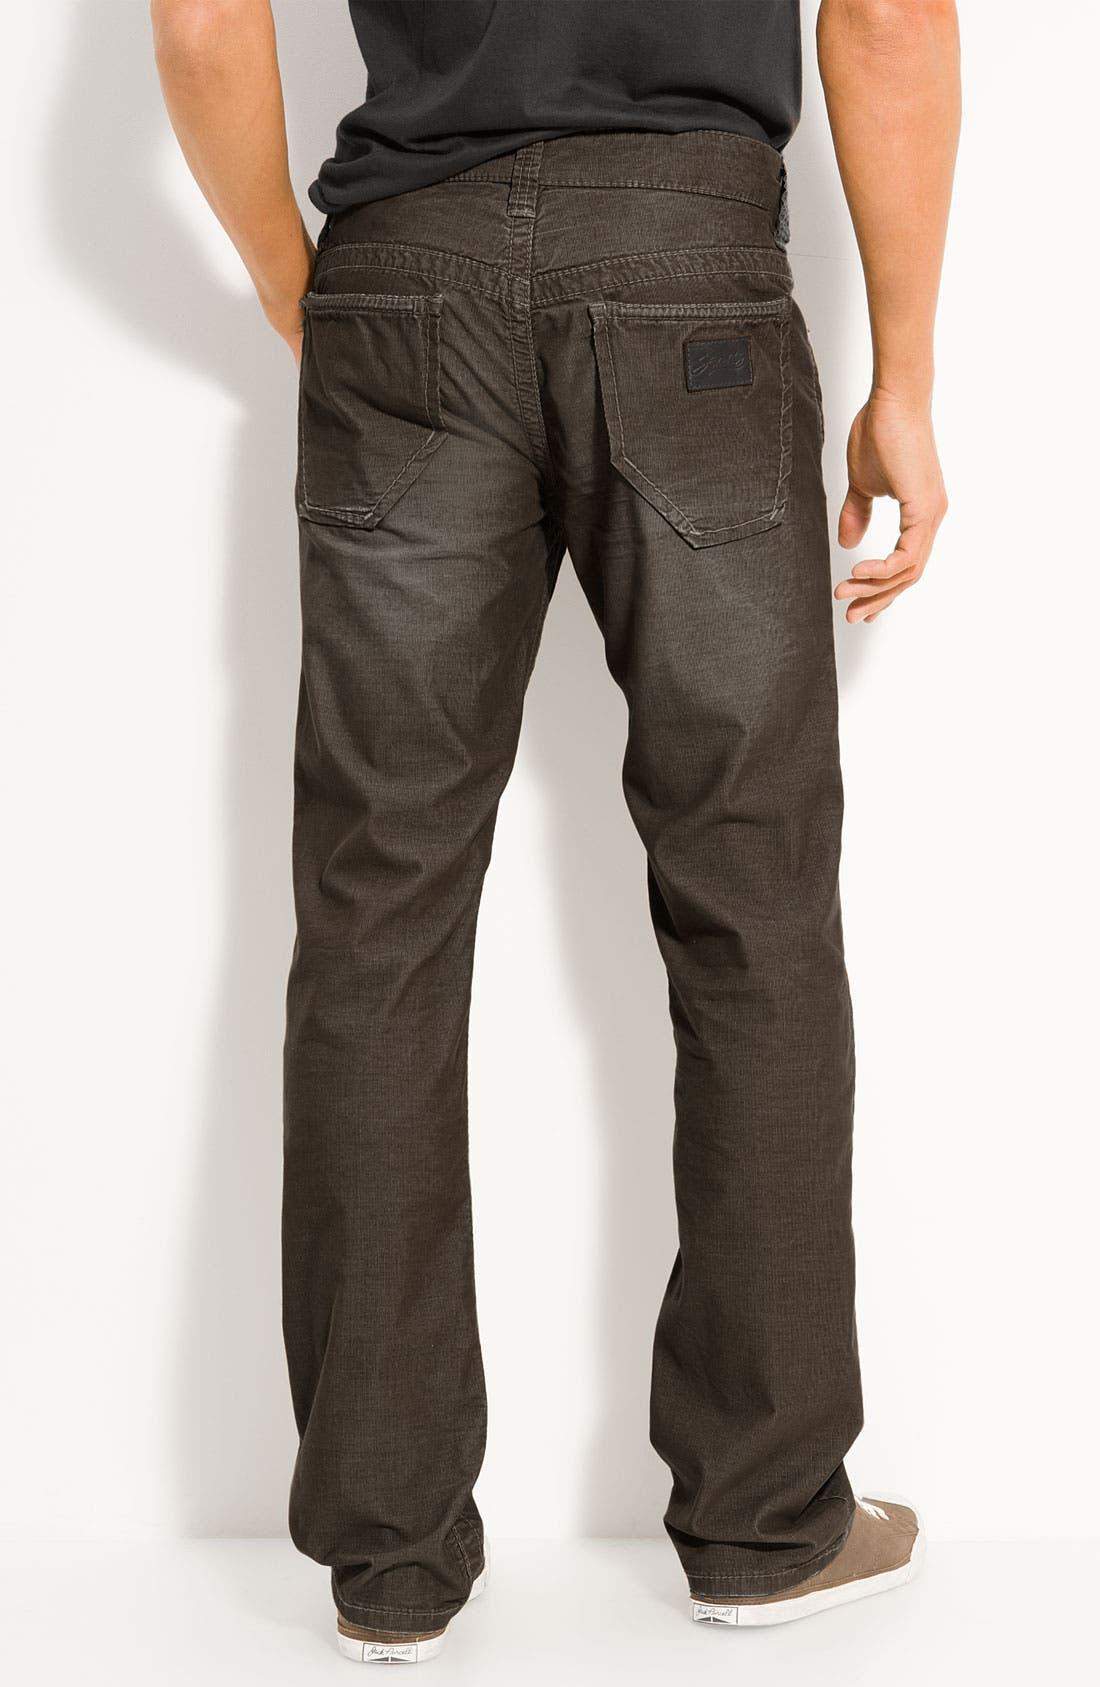 Alternate Image 1 Selected - Stitch's Jeans 'Texas' Straight Leg Corduroy Pants